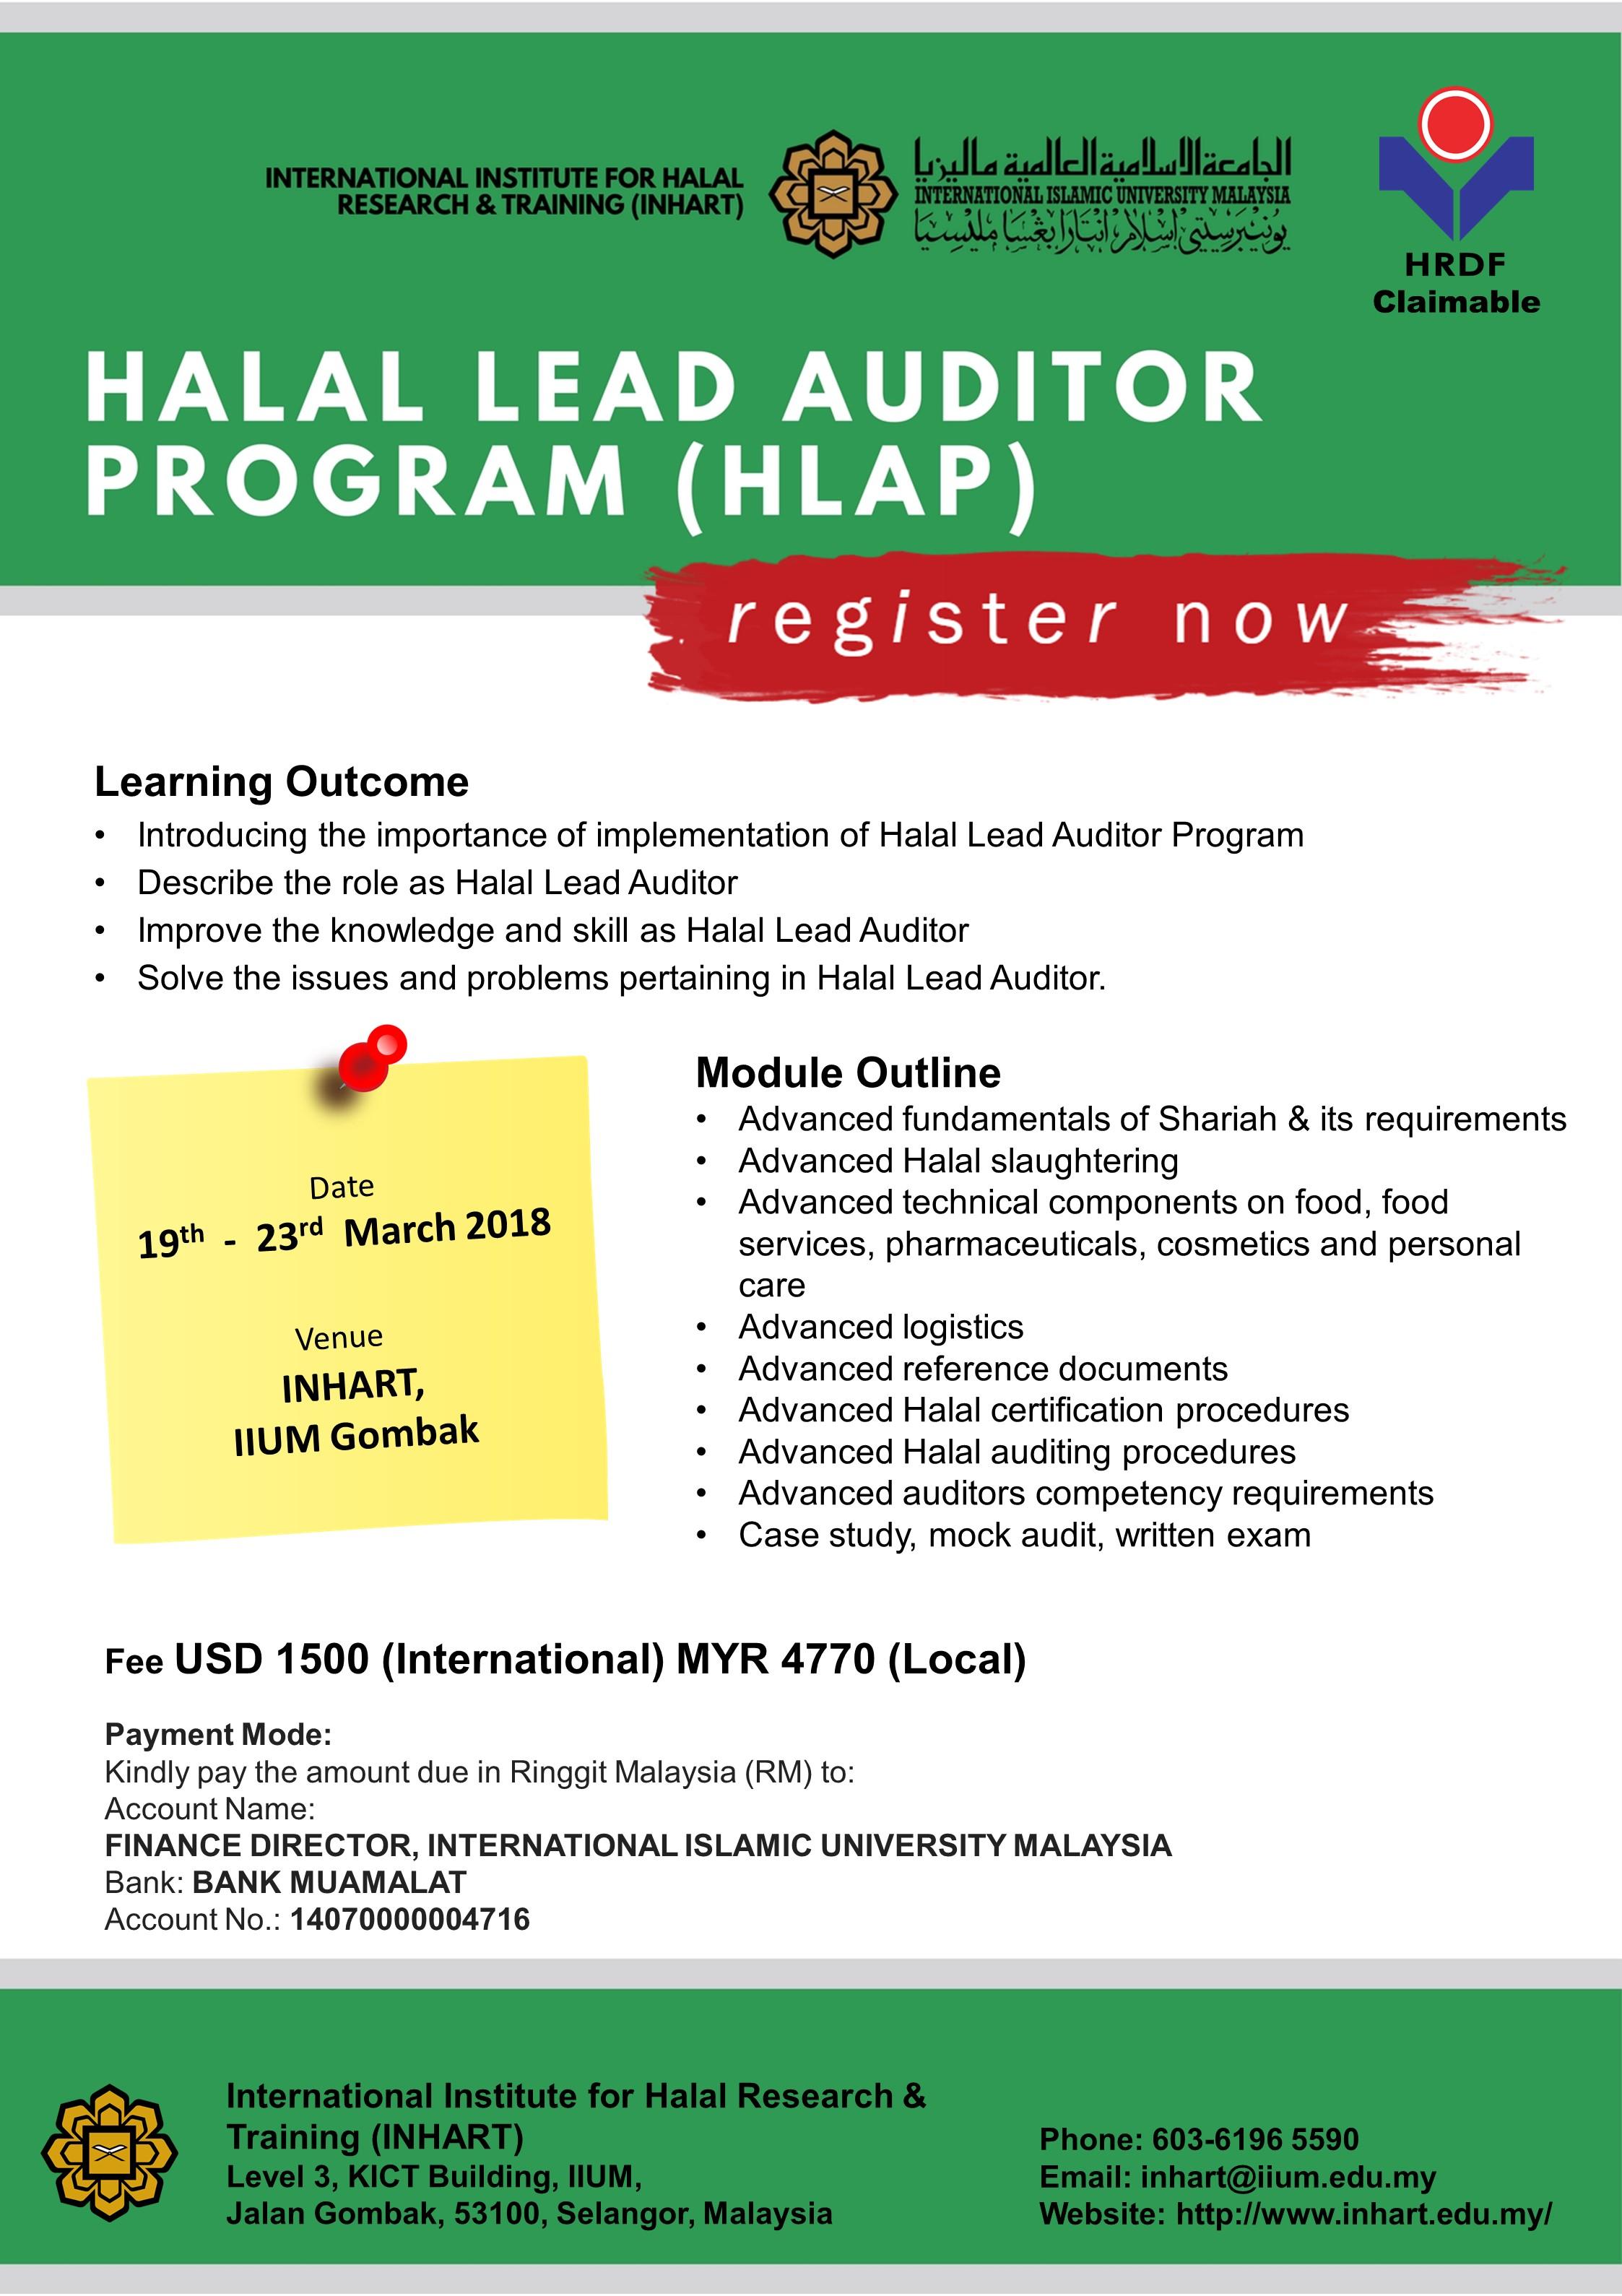 Halal Lead Auditor Program (HLAP)